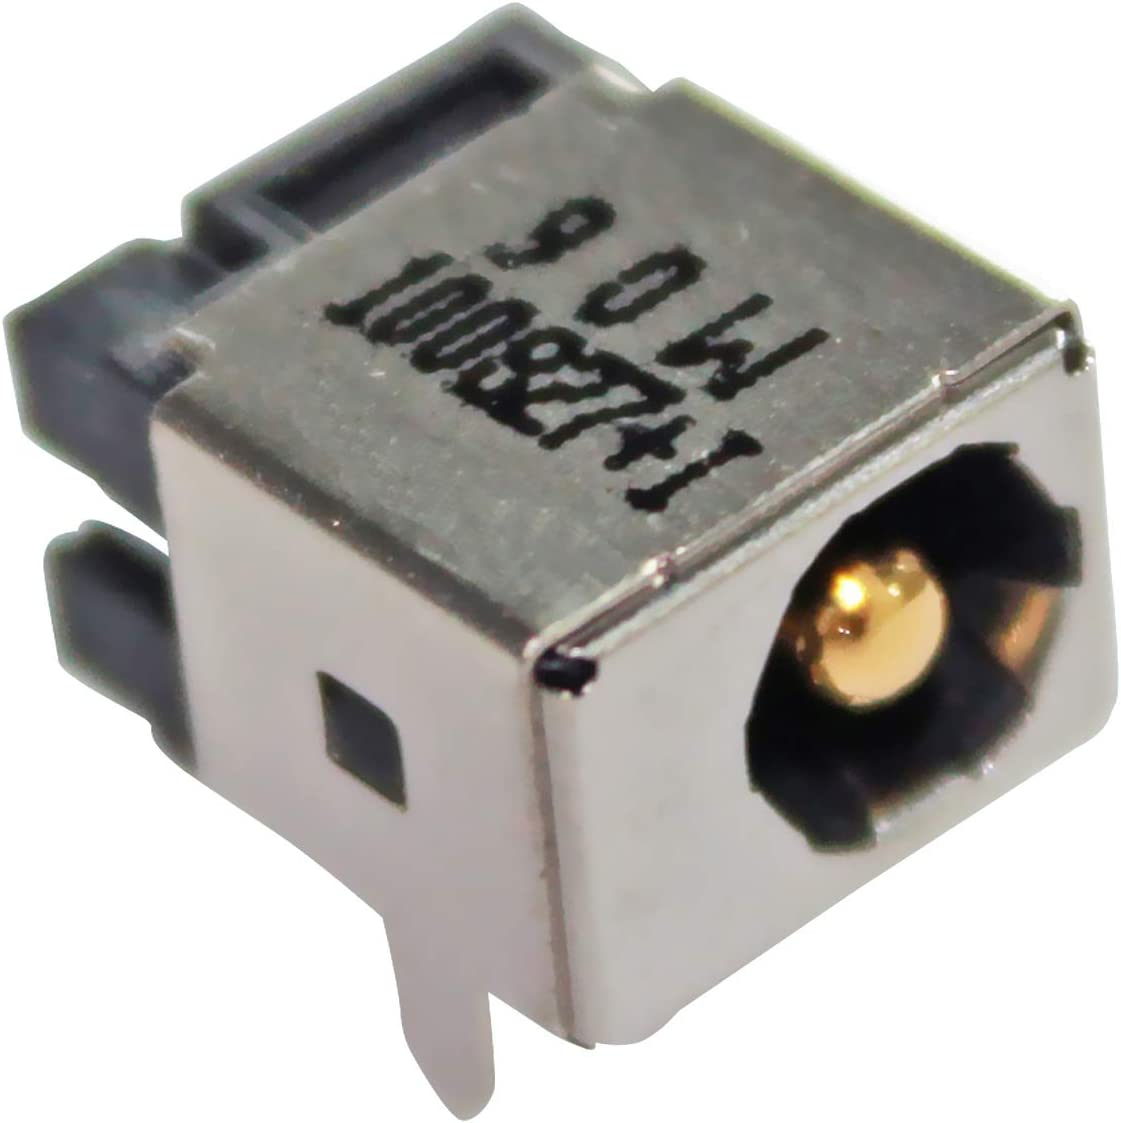 Zahara 10PCS DC Power Jack Replacement for ASUS K73 K73B K73S N53 N53S N53J N10E UL30 N71 N71J N71V A73